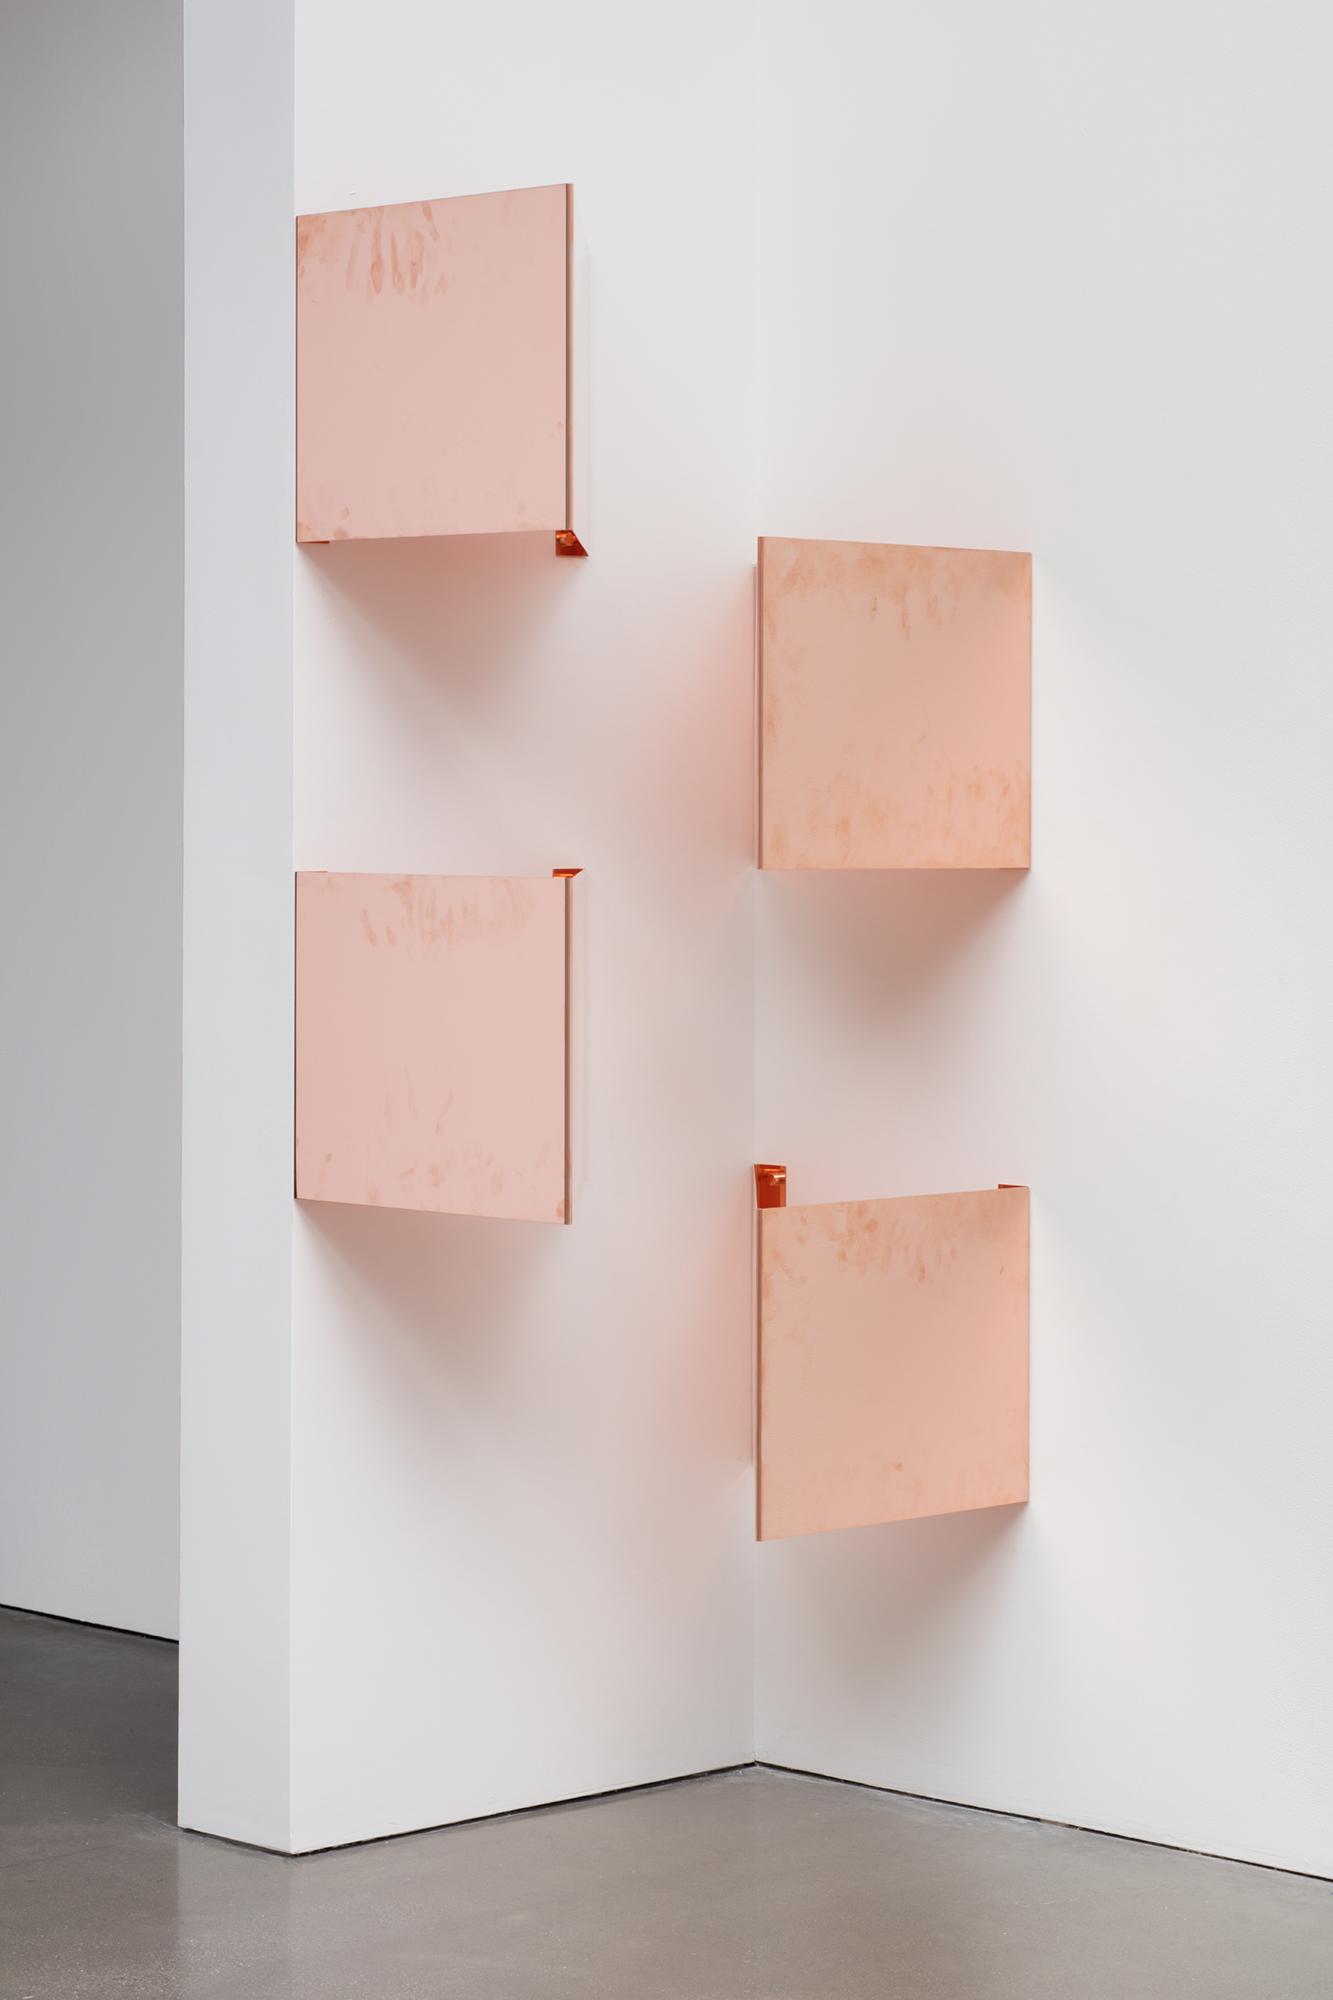 "Copper Surrogates (48"" x 120"" 48 ounce C11000 Copper Alloy, 45º/45º/90º, February 23–27/April 9, 2018, Los Angeles, California)   2018–  Polished copper  18 1/2 x 14 1/16 x 18 1/2 inches each, 4 parts   Equivalents, 2018"